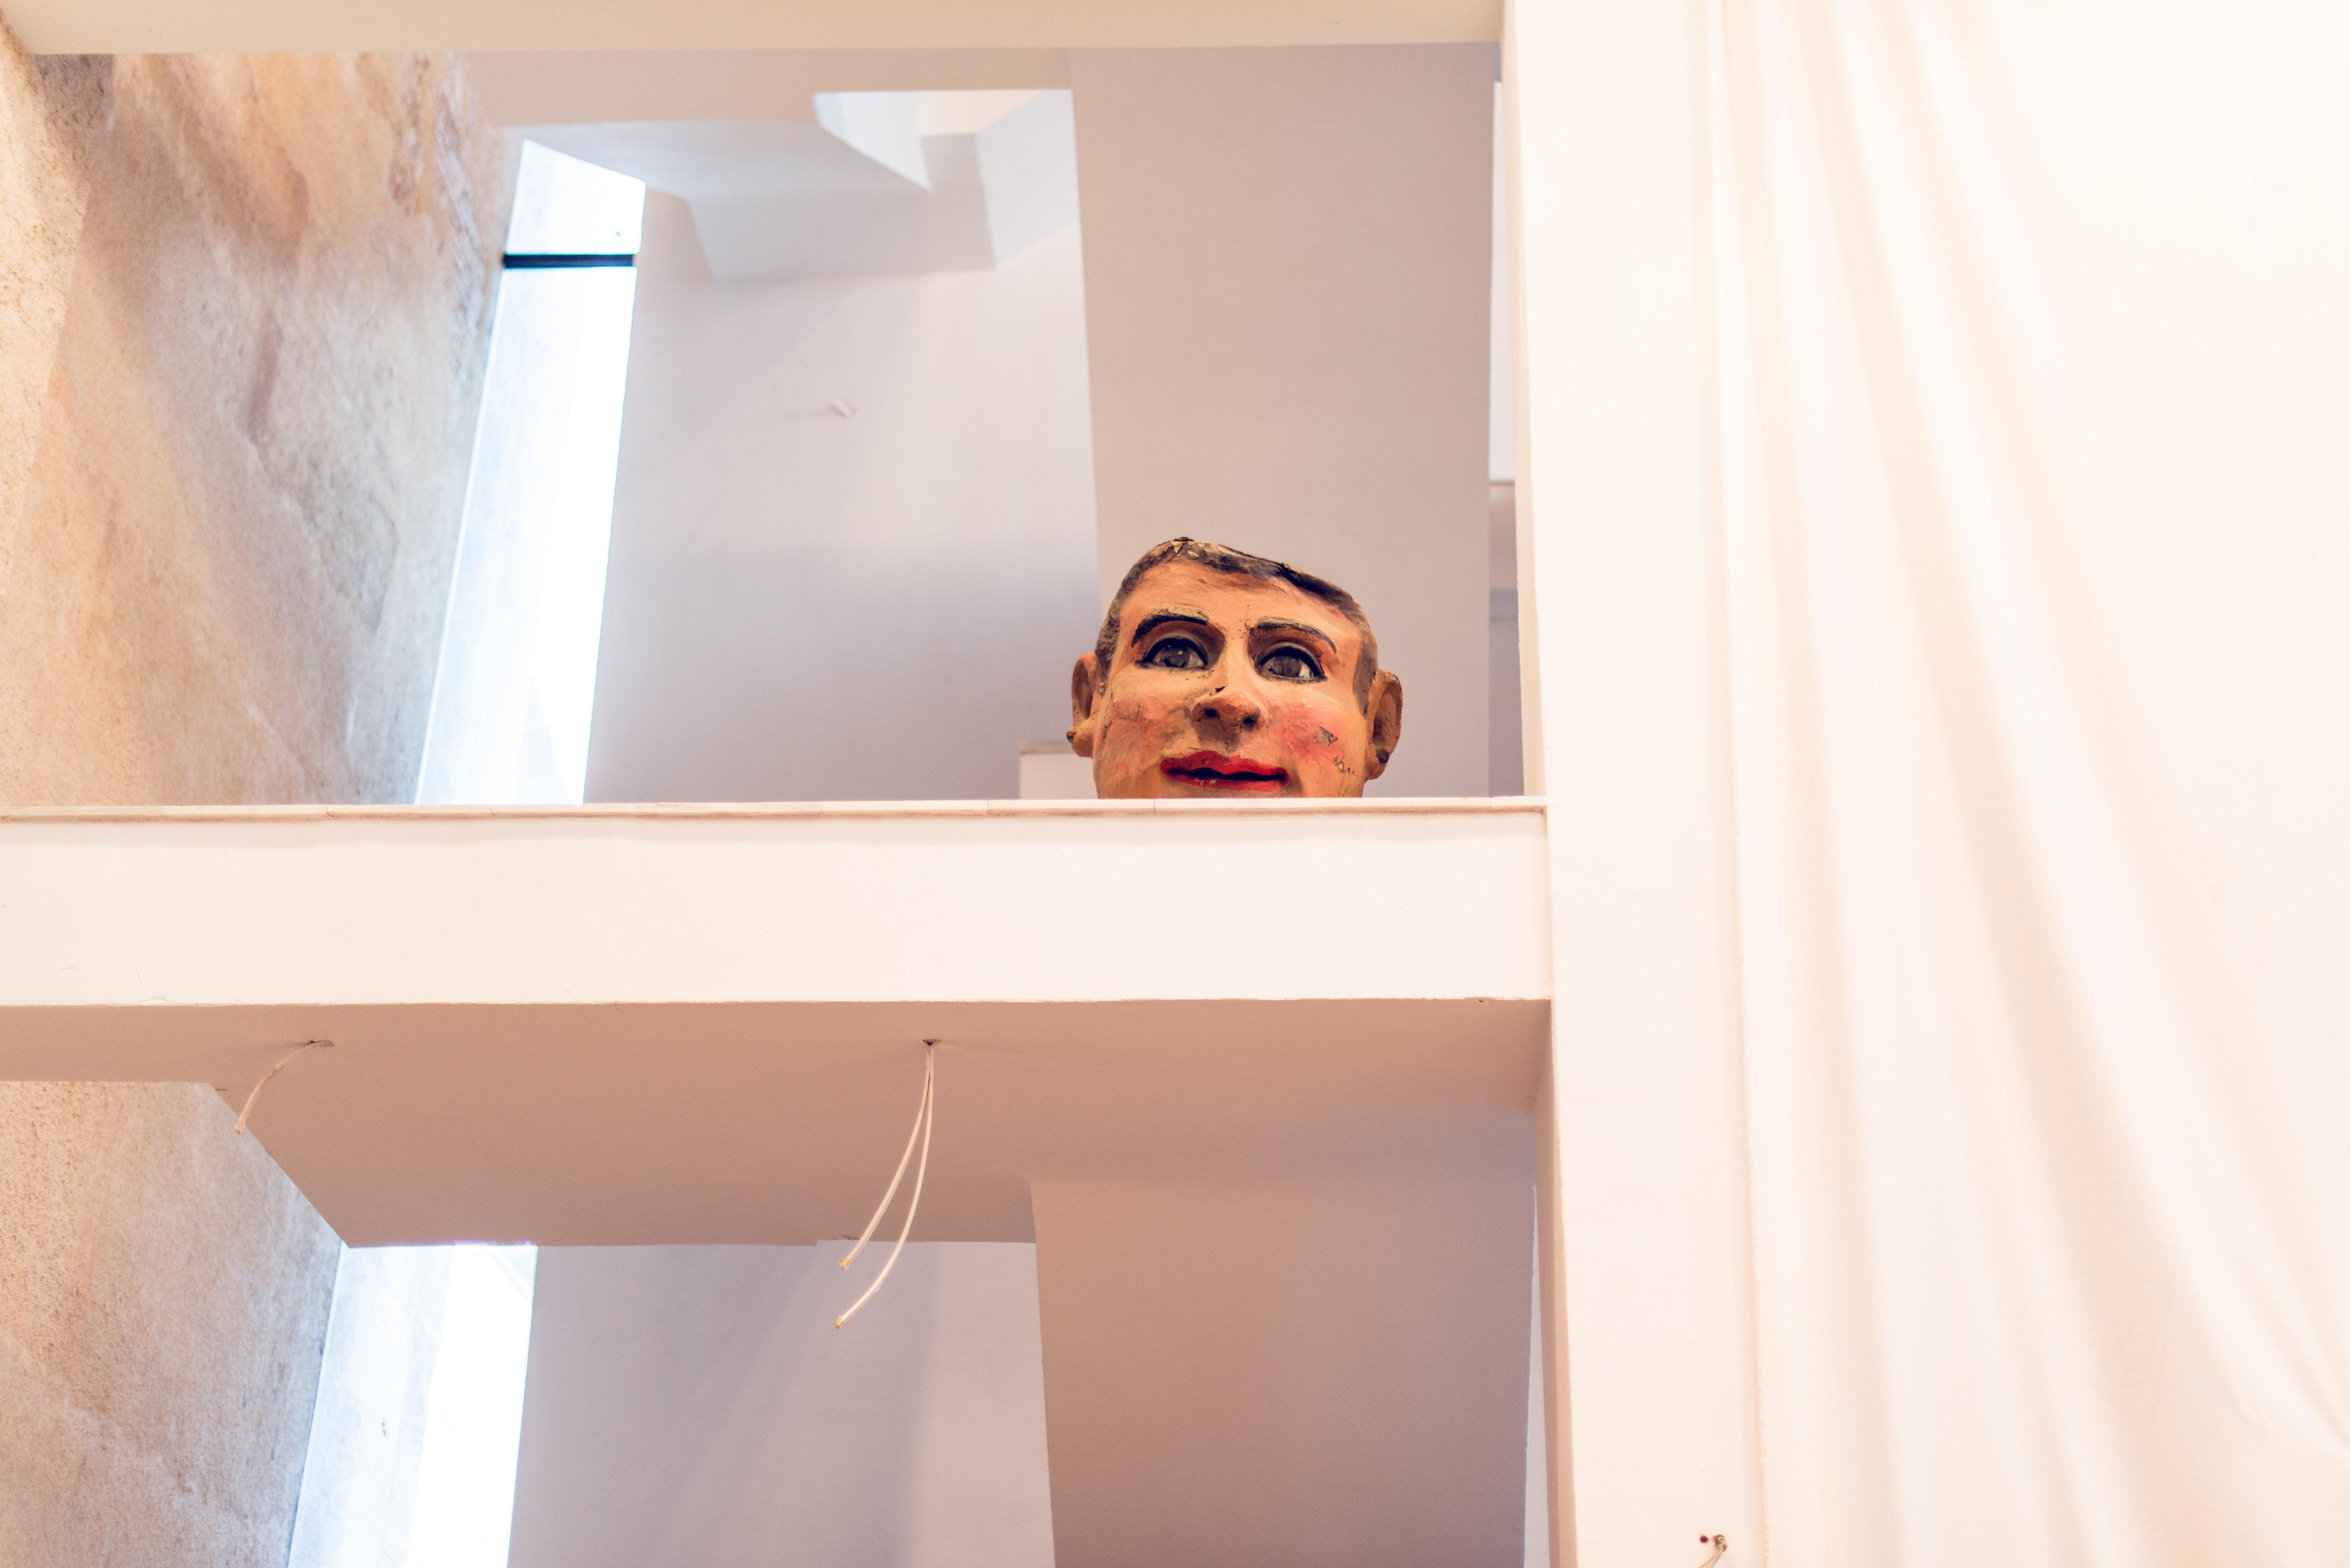 human face decor on shelf